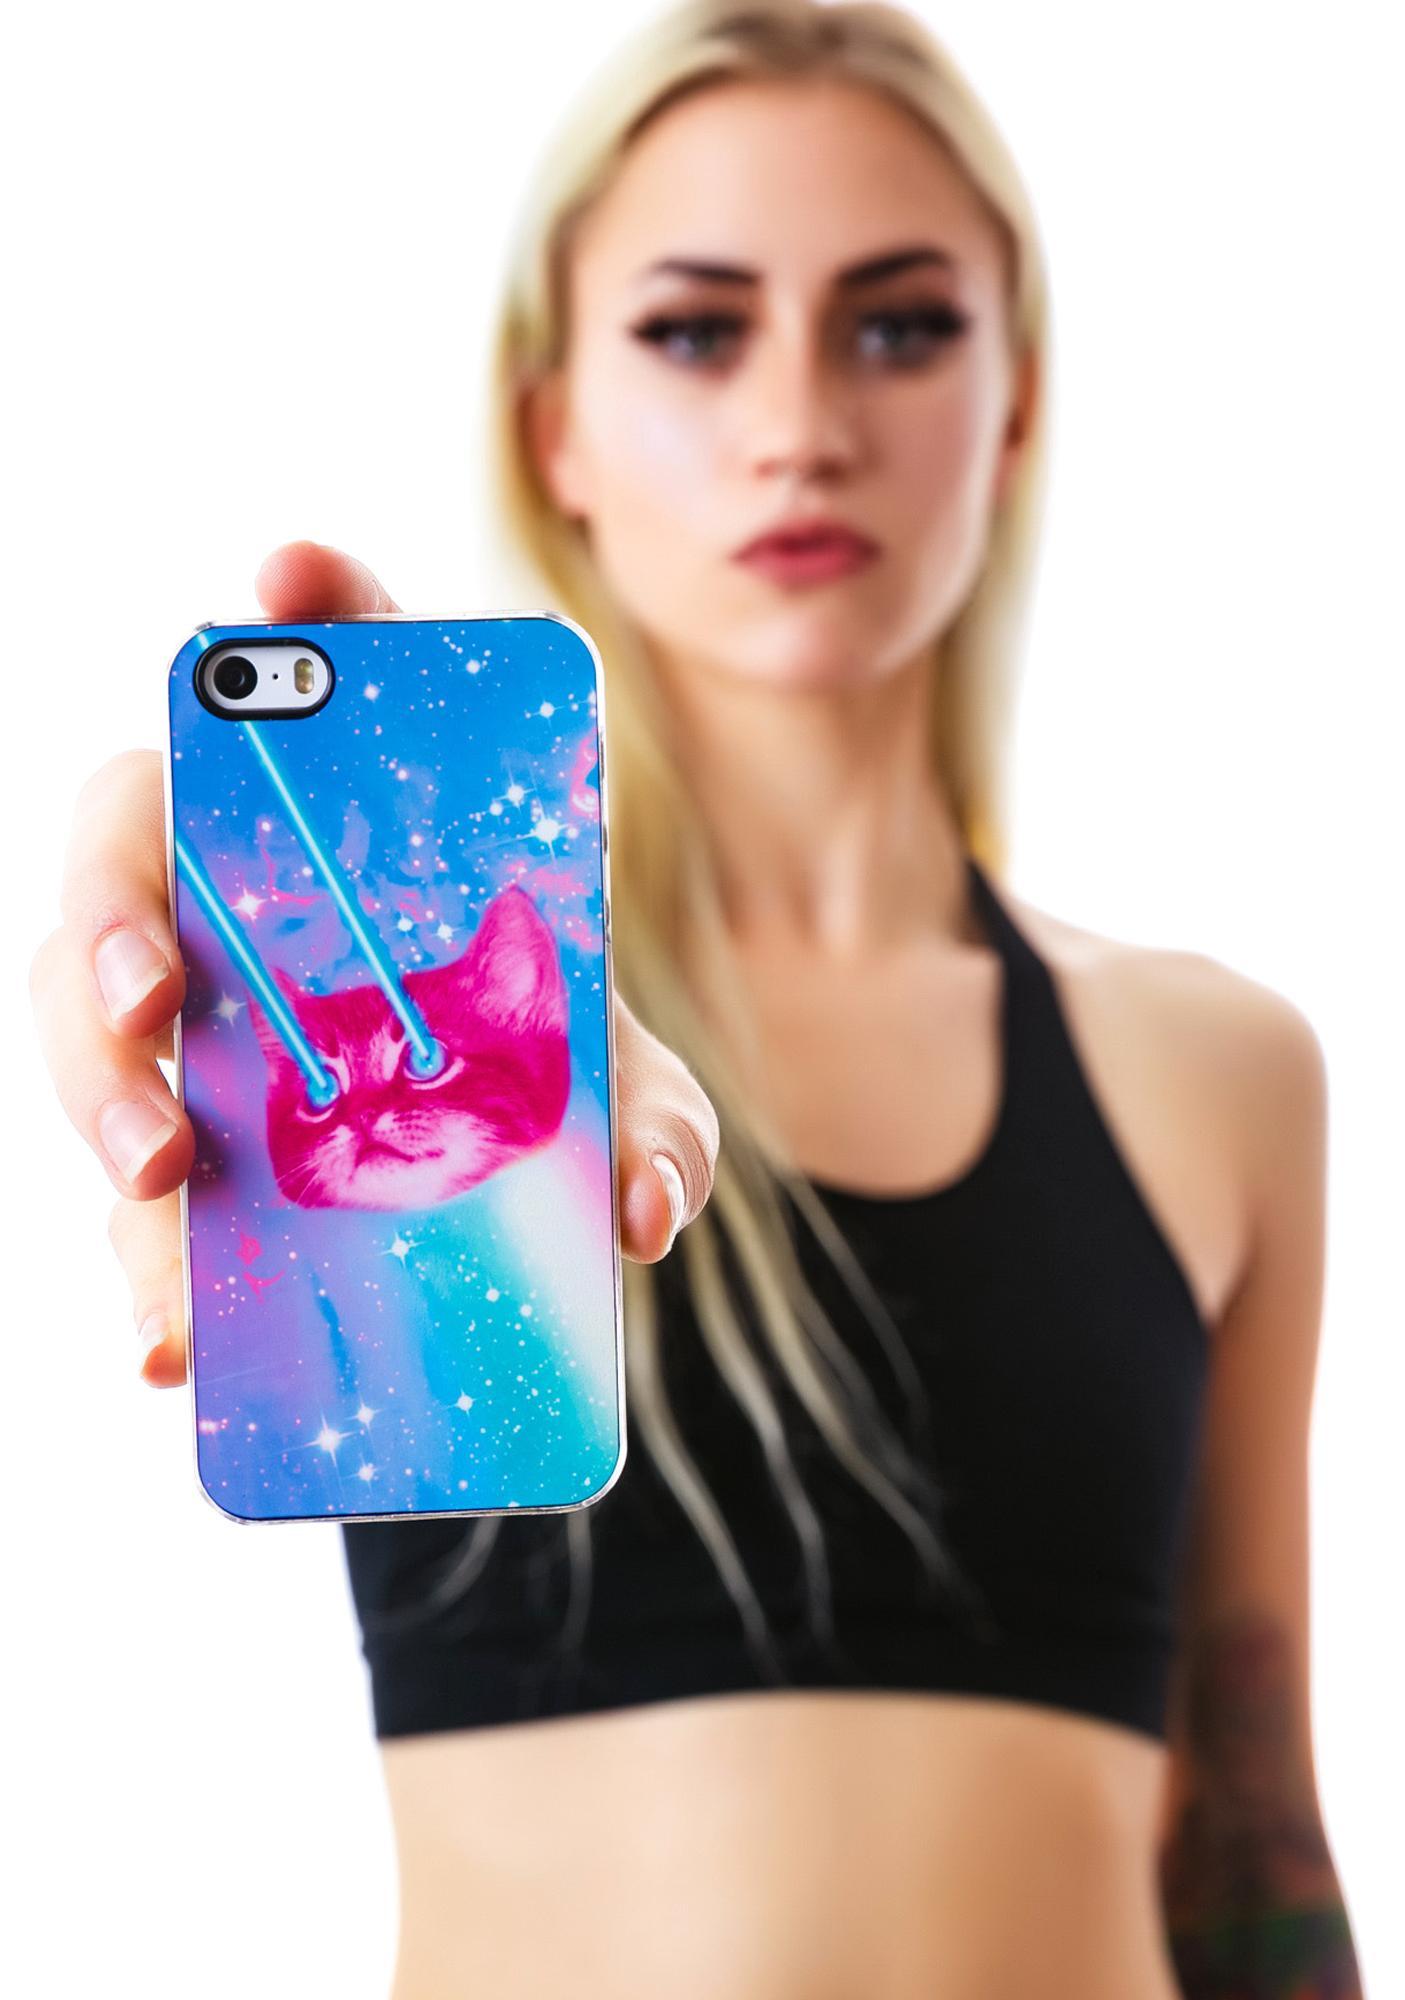 Nyan's Revenge iPhone 5 Case